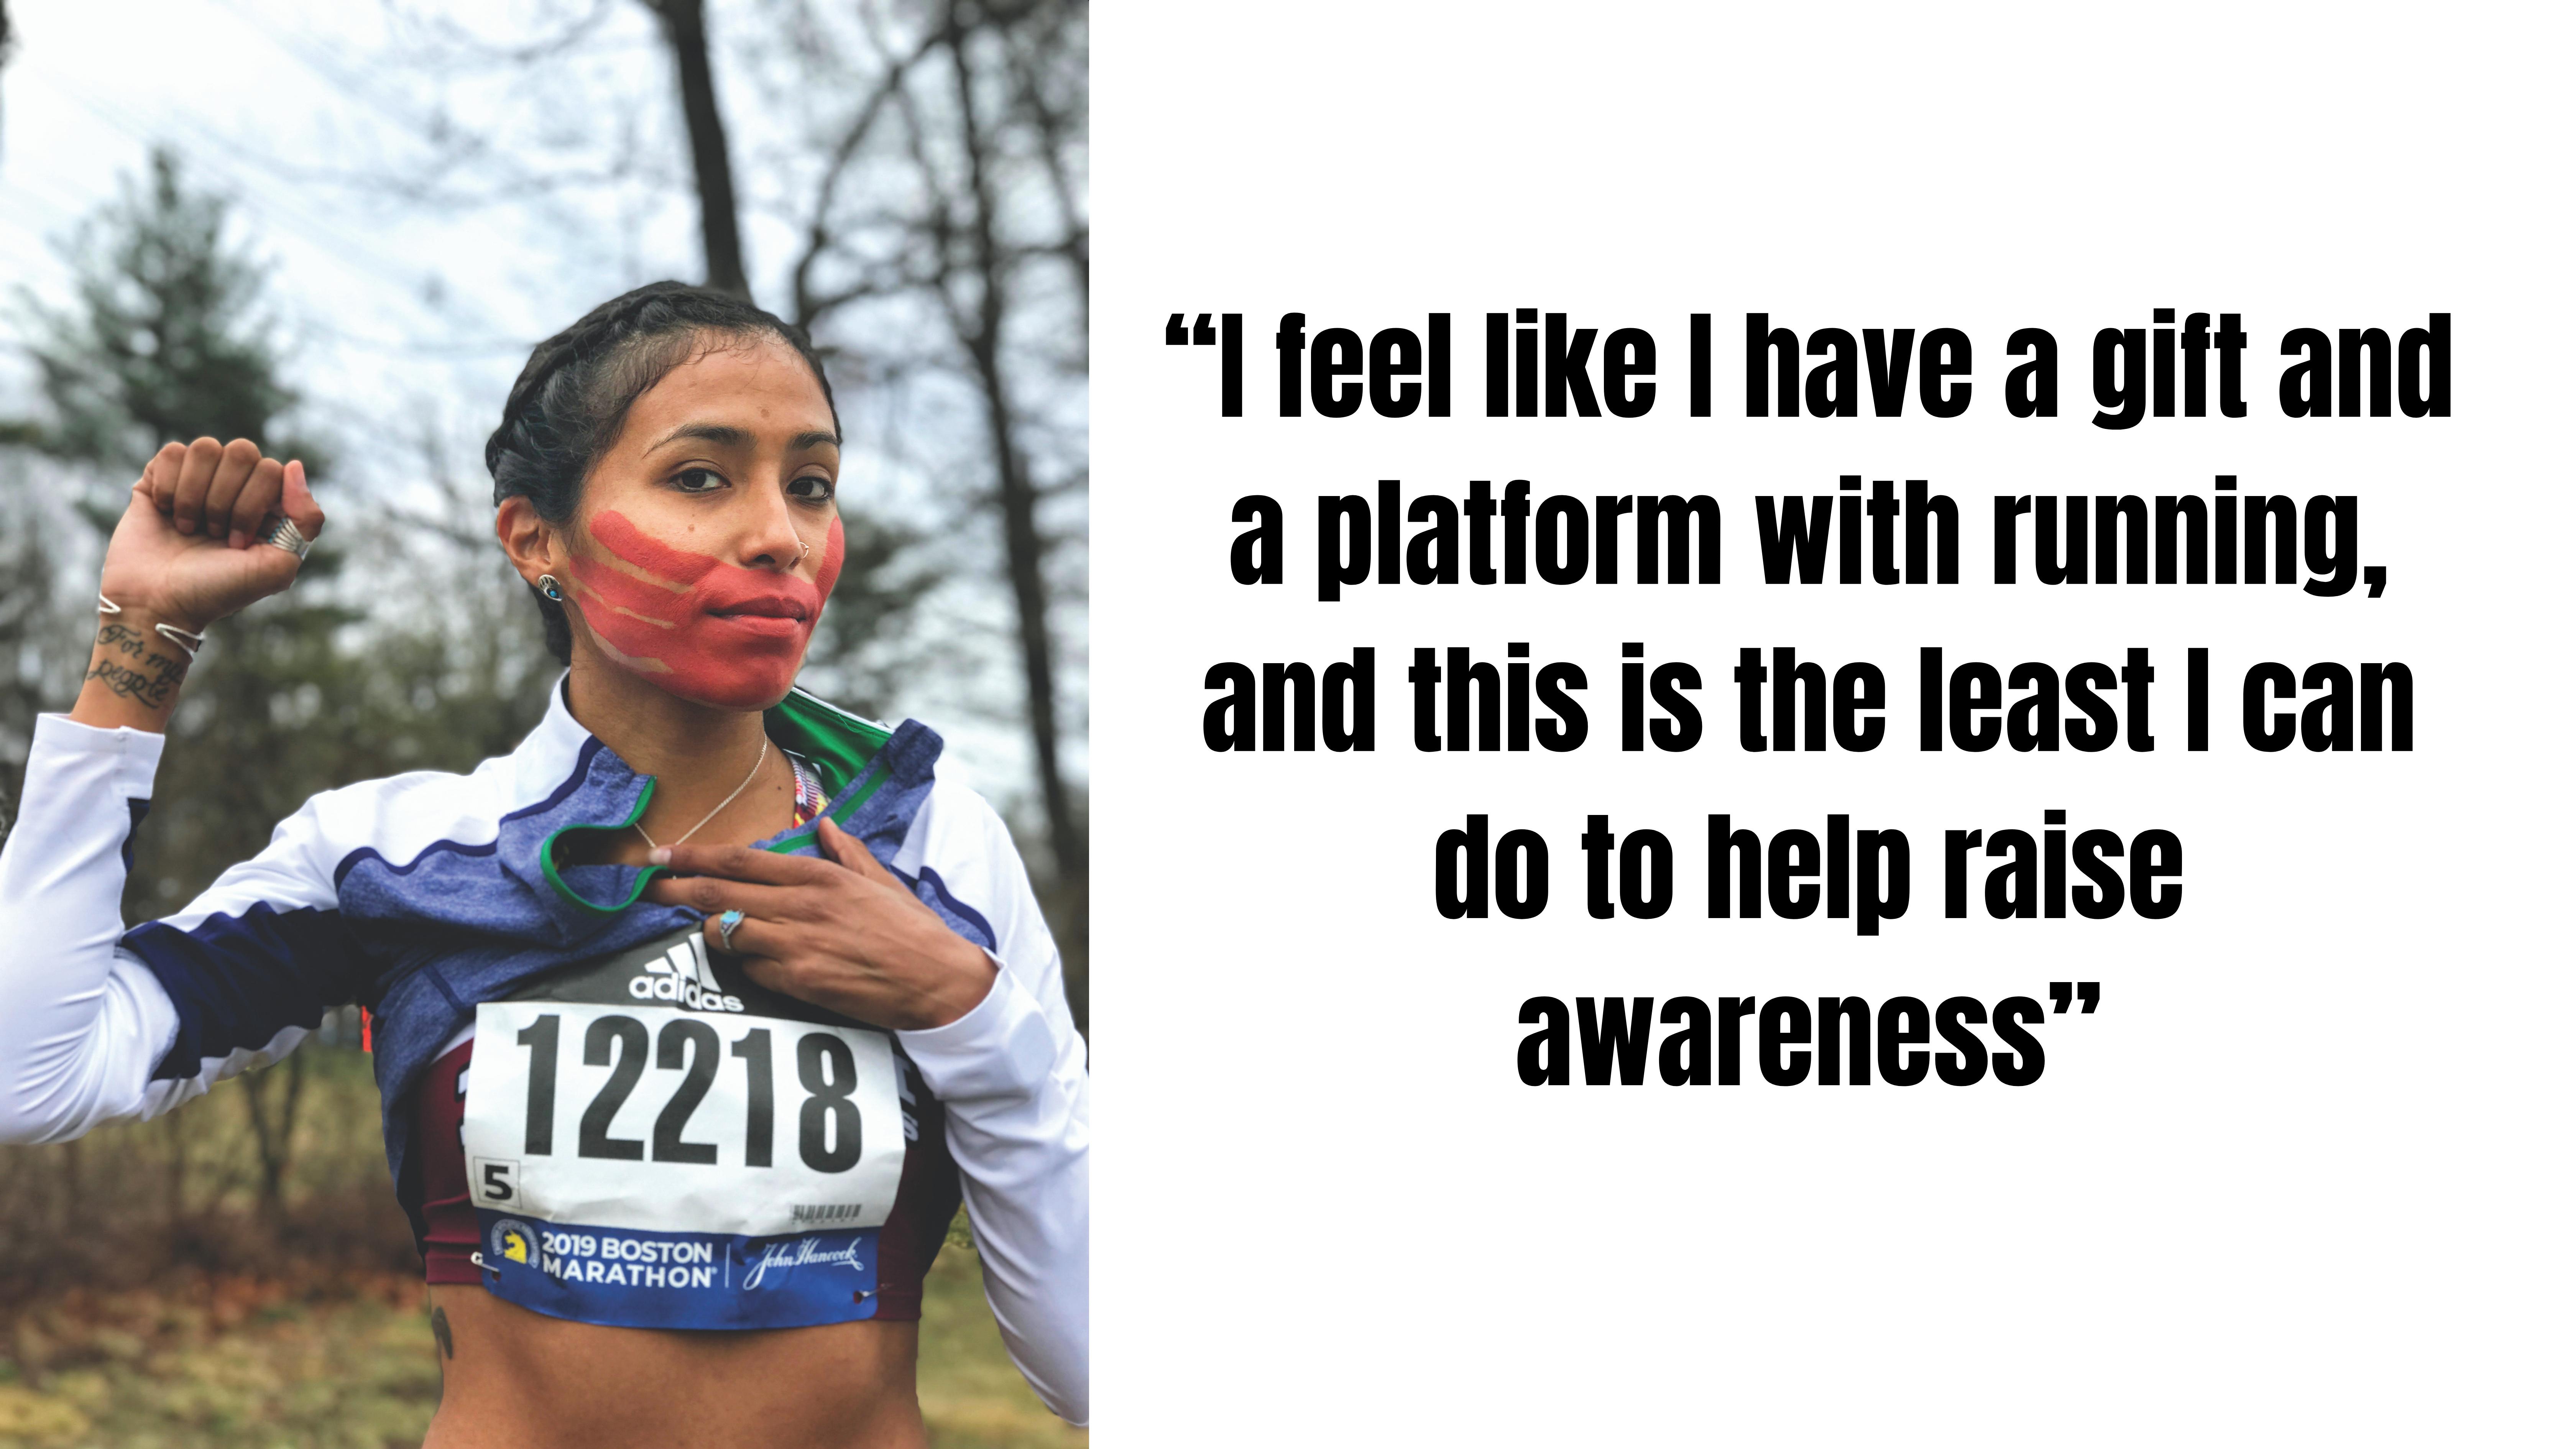 2 Running For Justice | Trail Runner Magazine